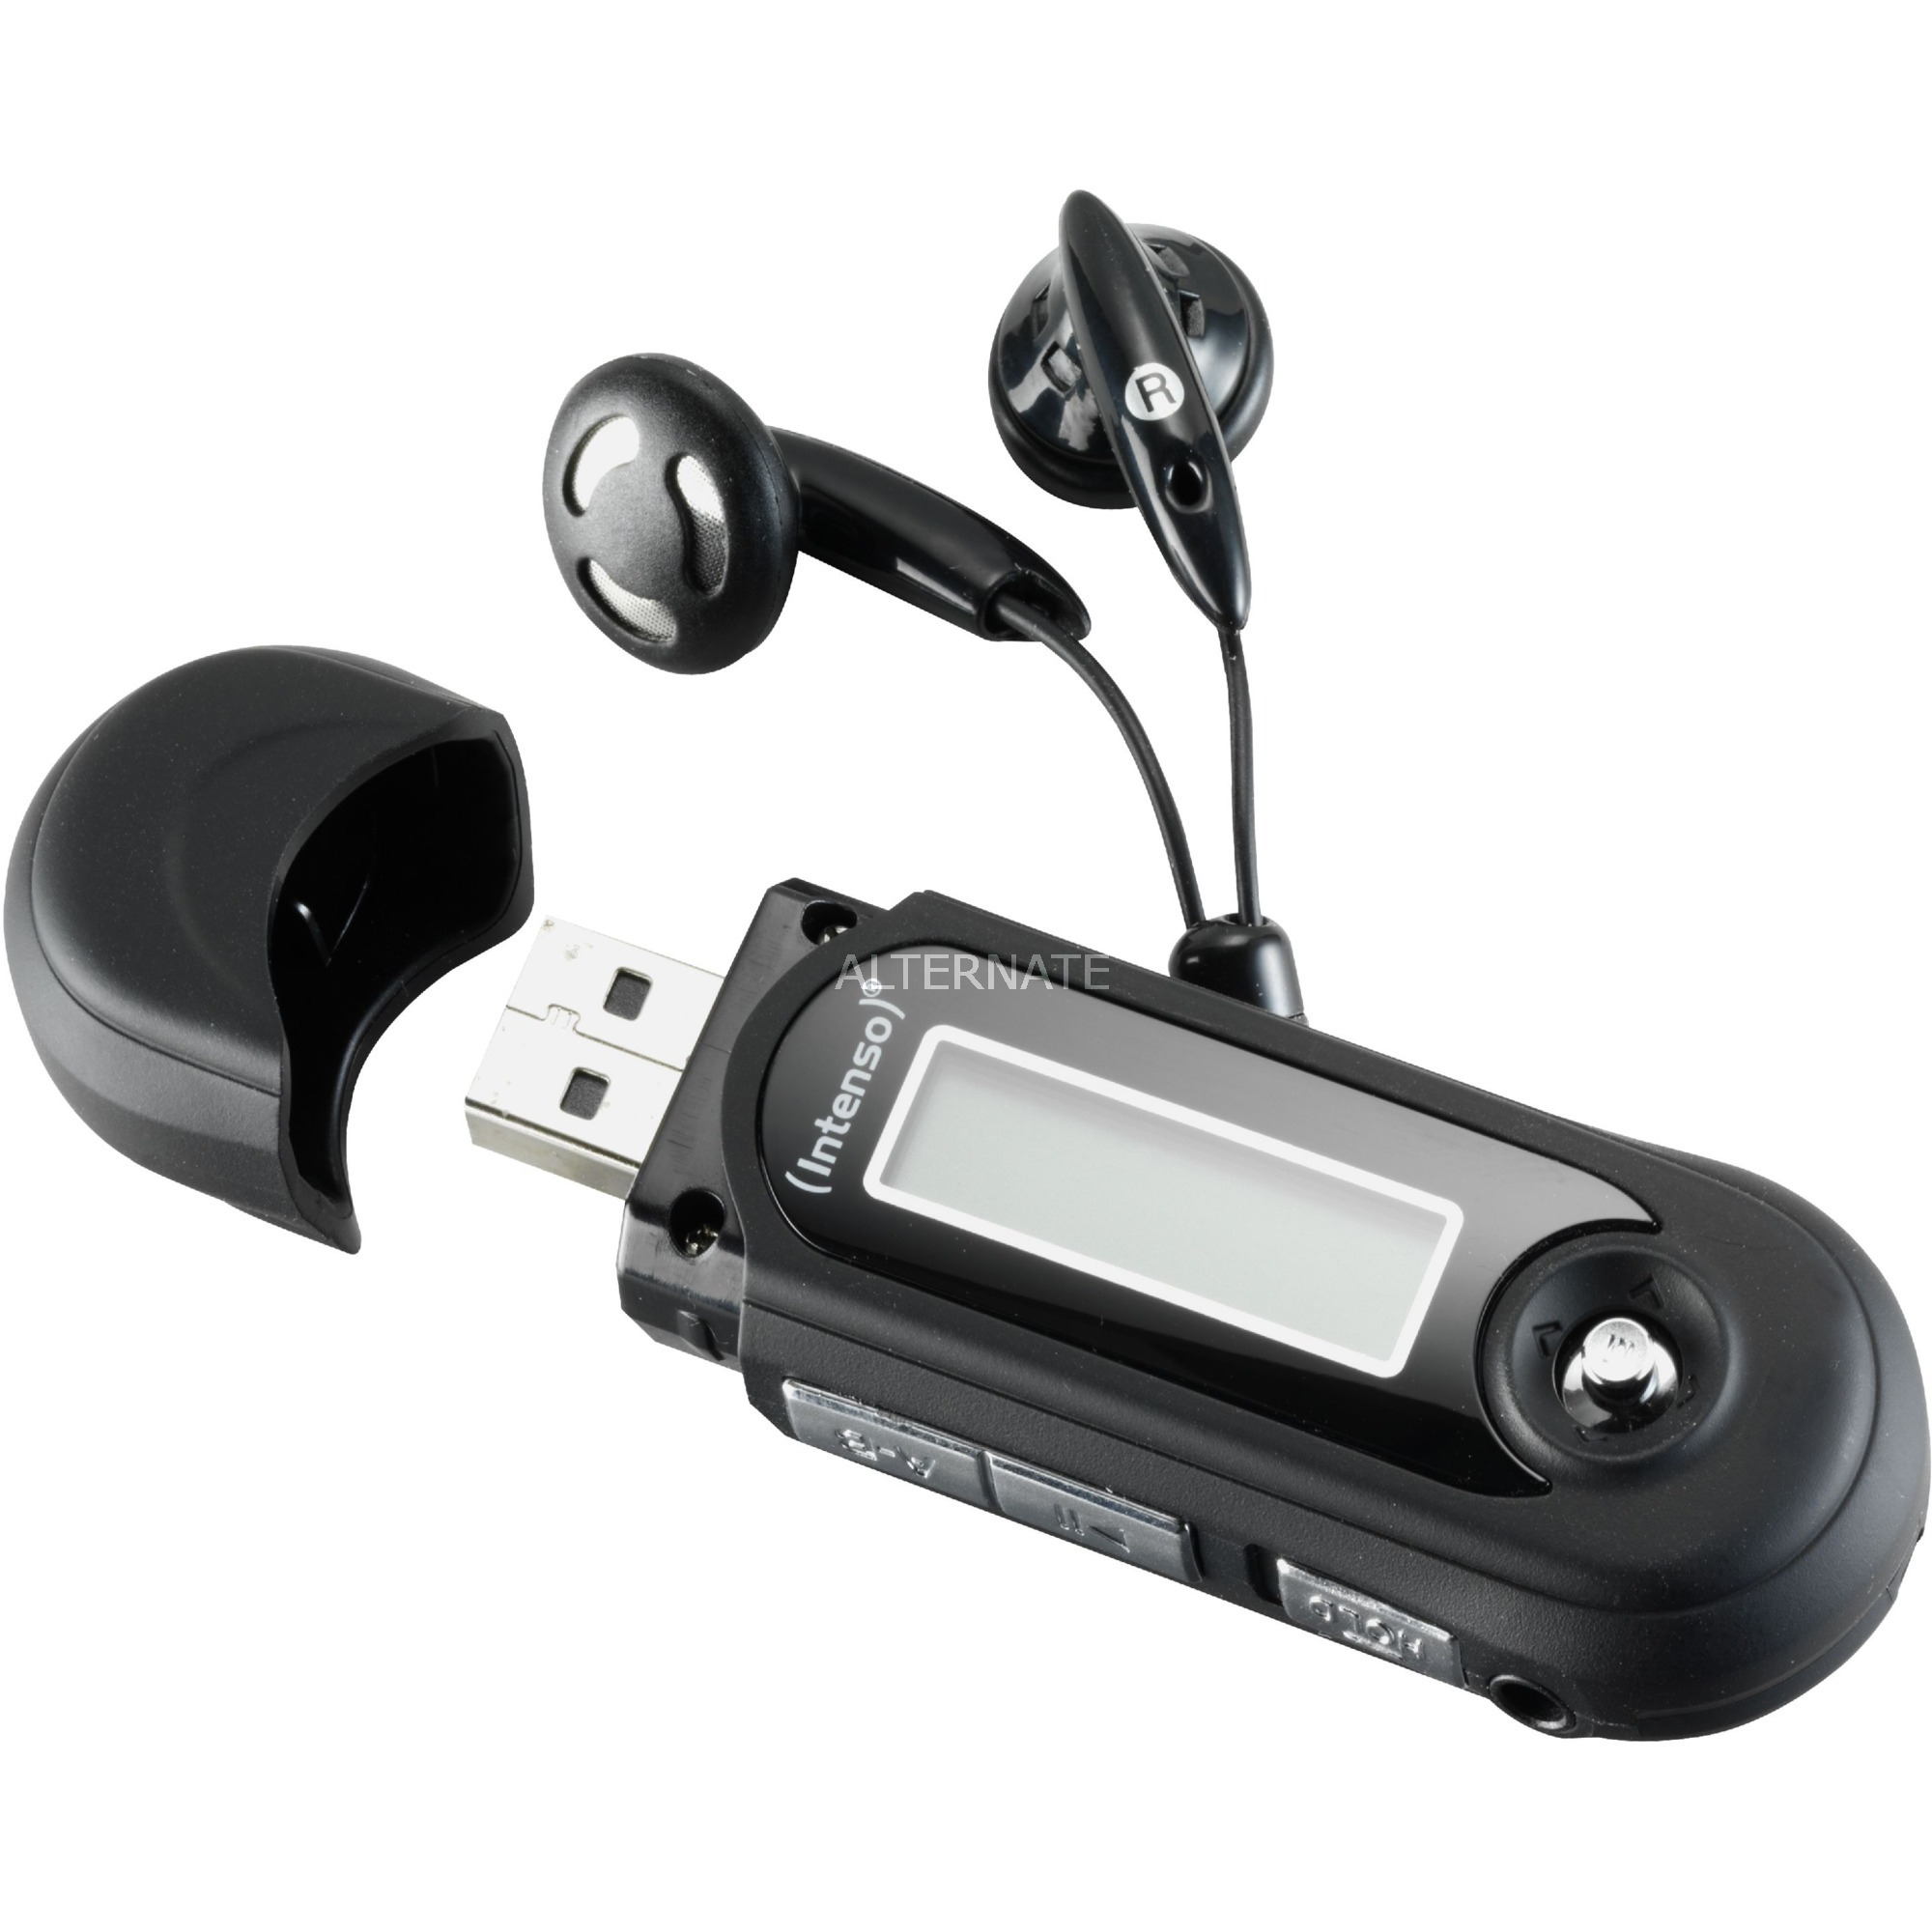 3601460 reproductor MP3/MP4 Reproductor de MP3 Negro 8 GB